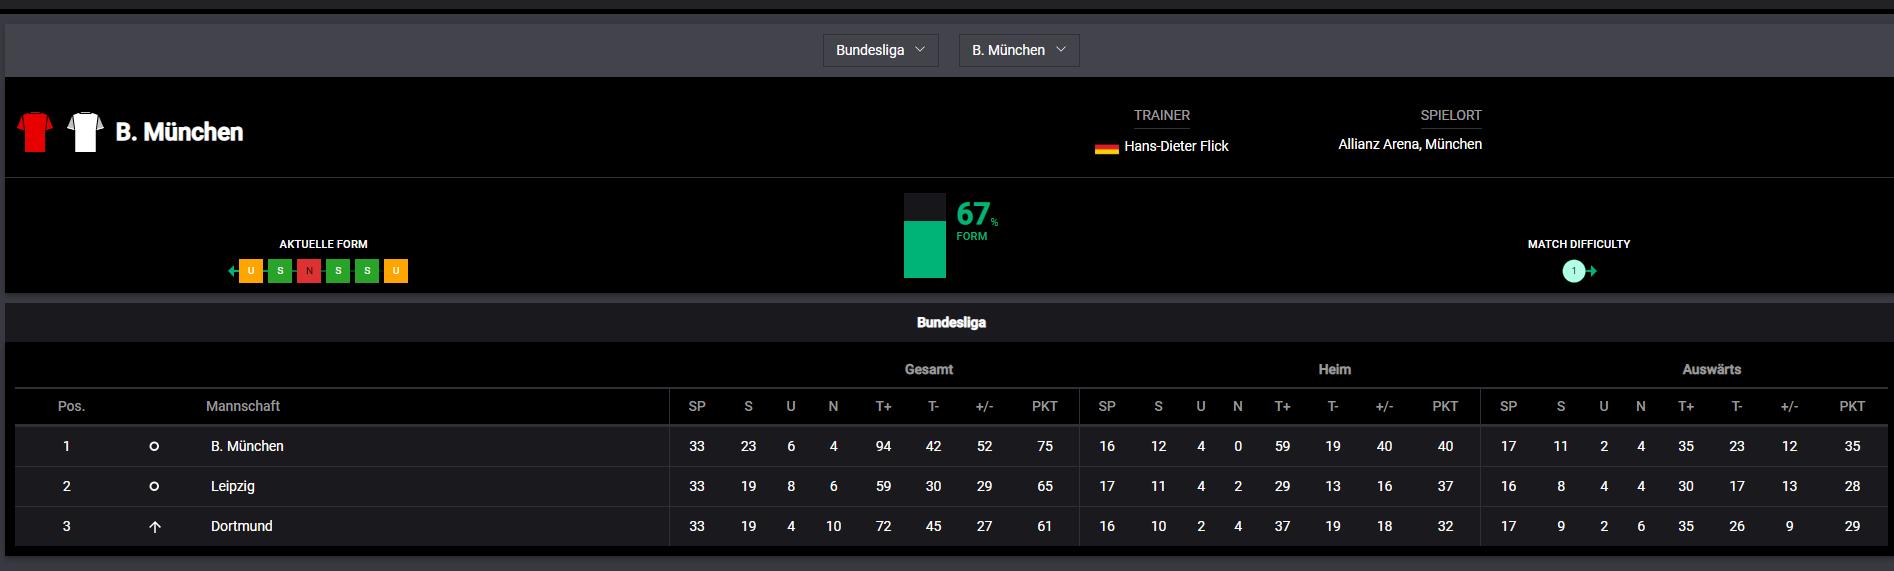 Bitkingz Fussball Statistik